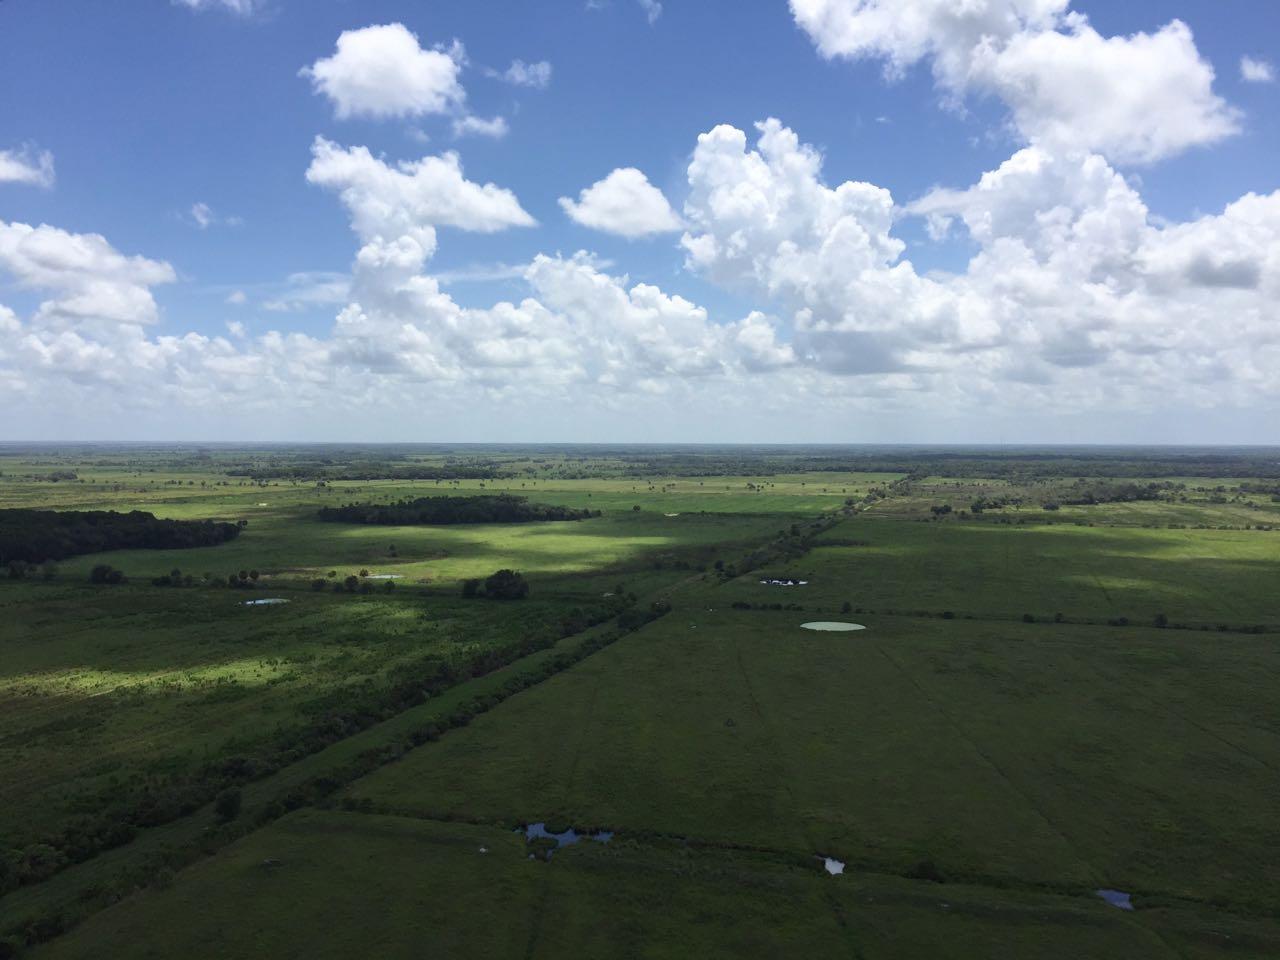 deseret-cattle-citrus-florida-ranch (6).jpg